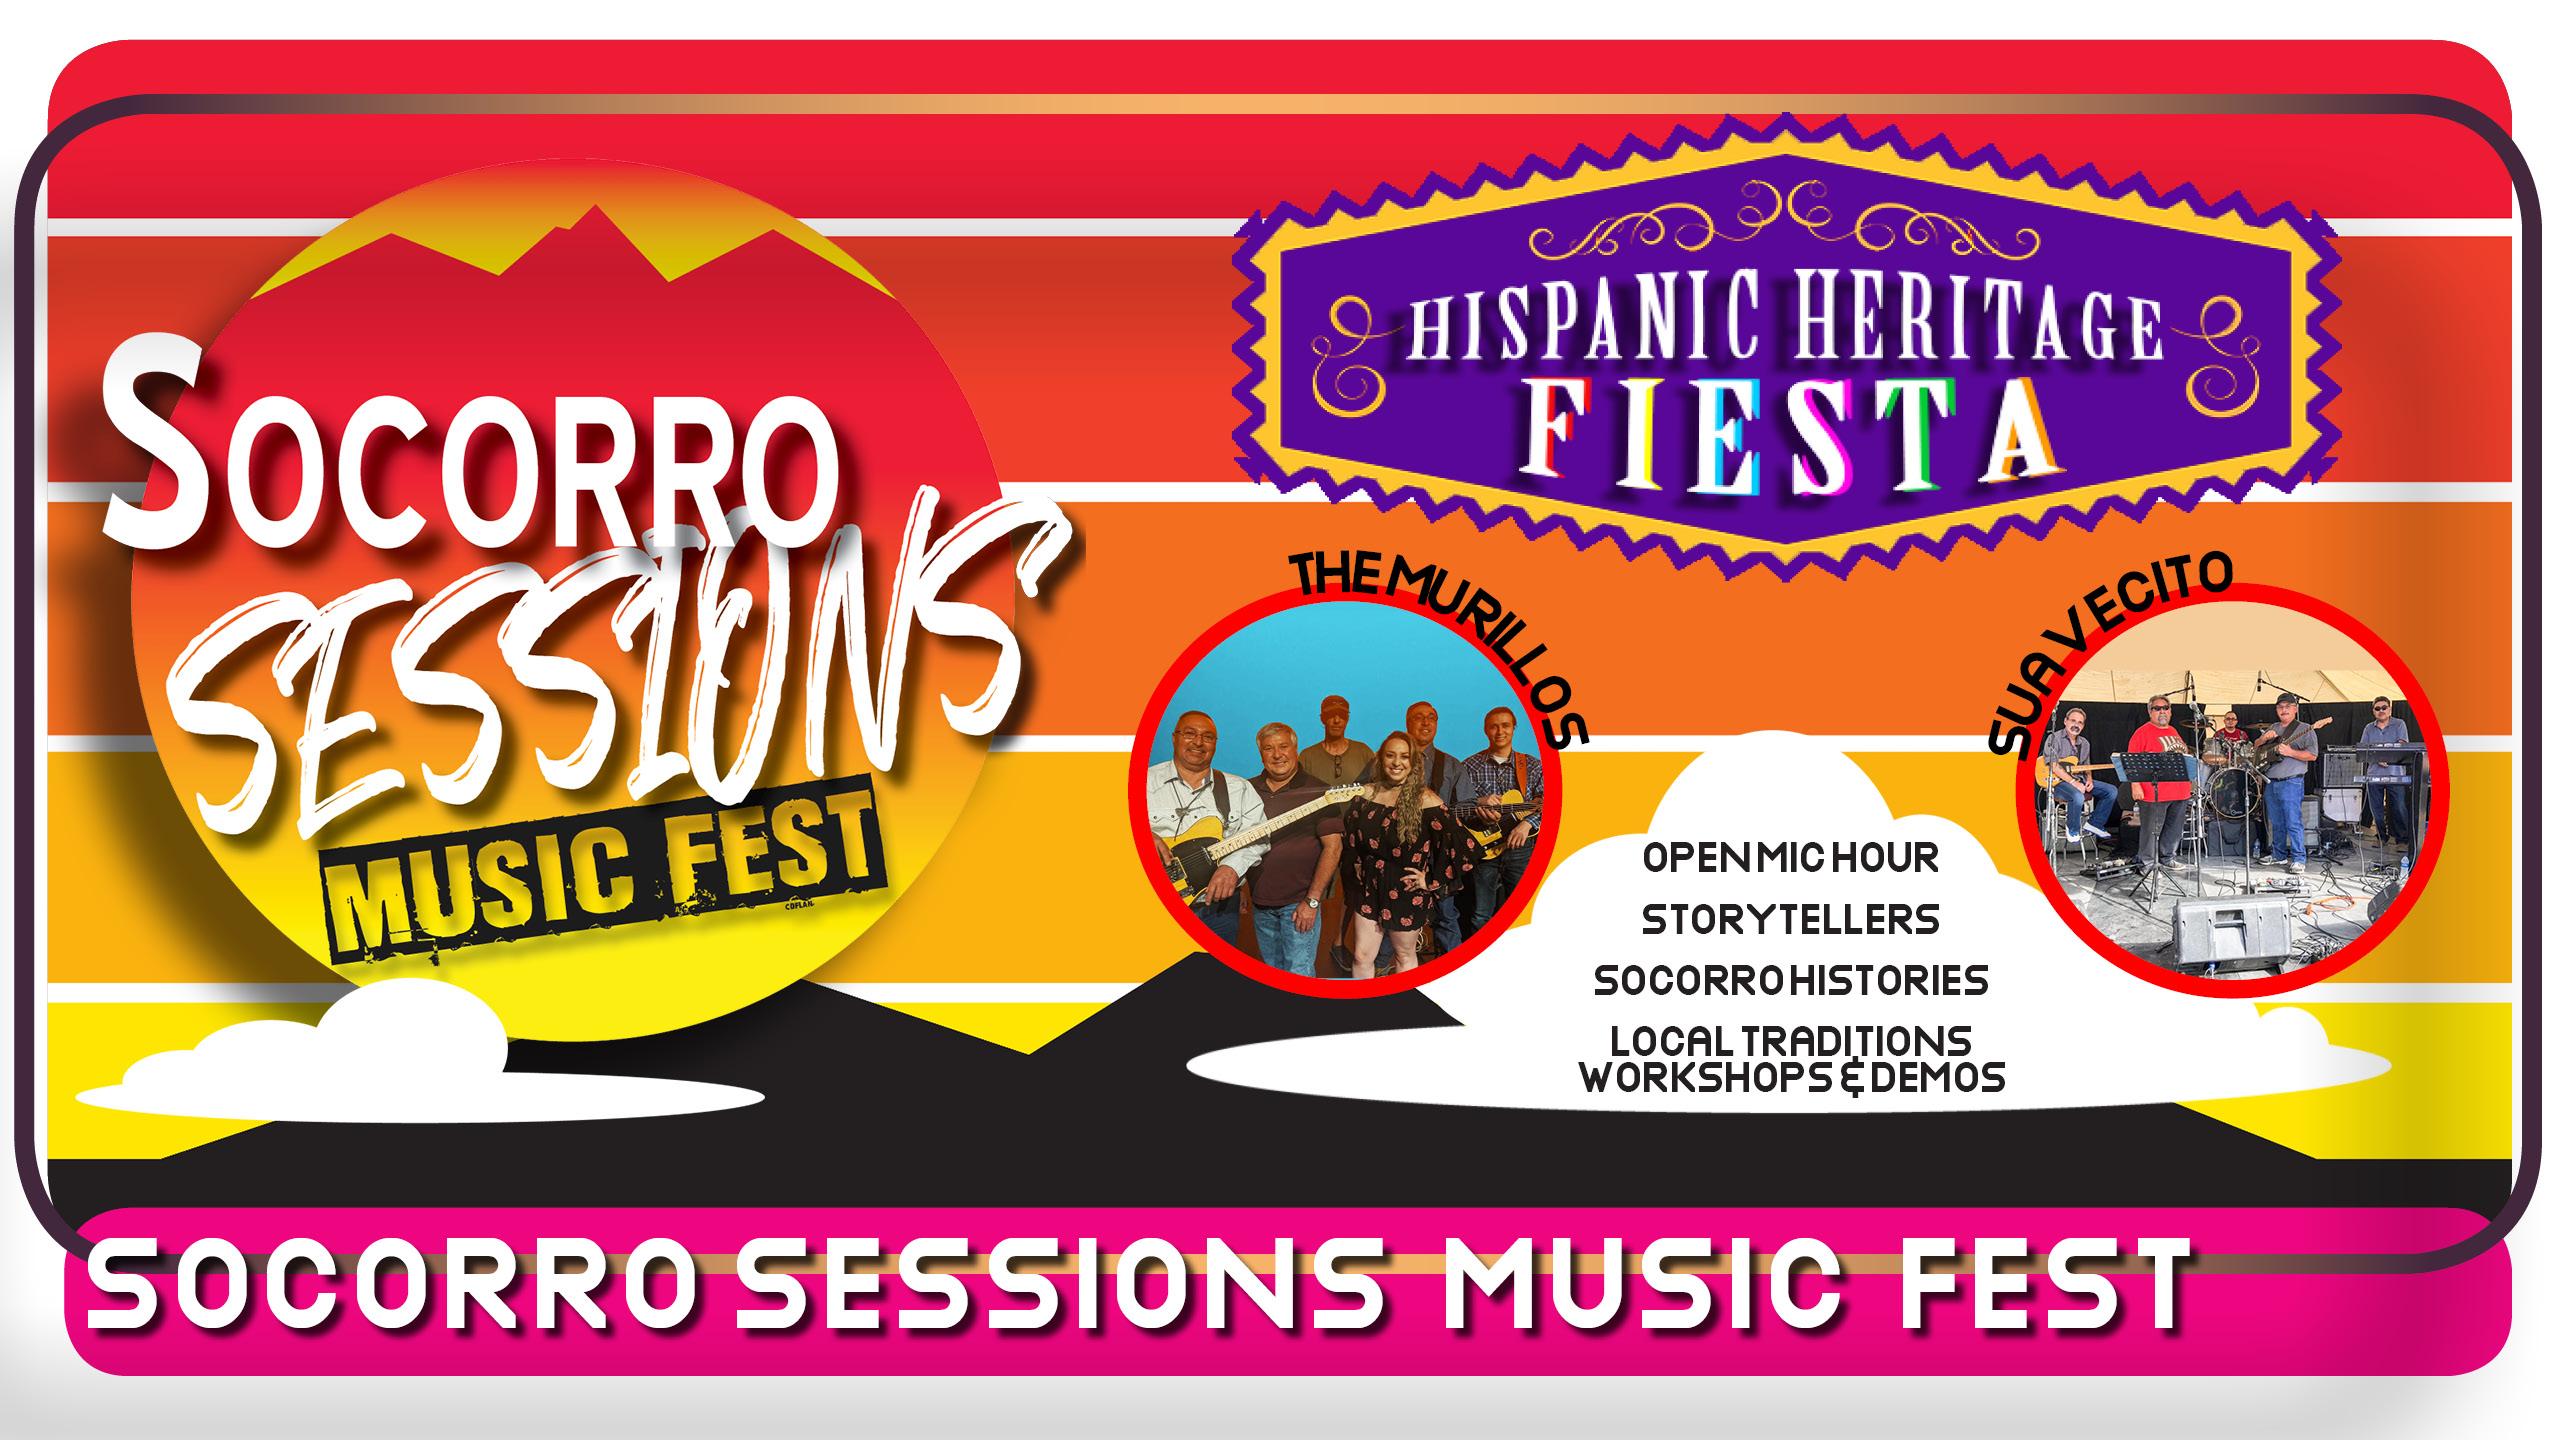 Socorro Sessions Hispanic Heritage Fiesta